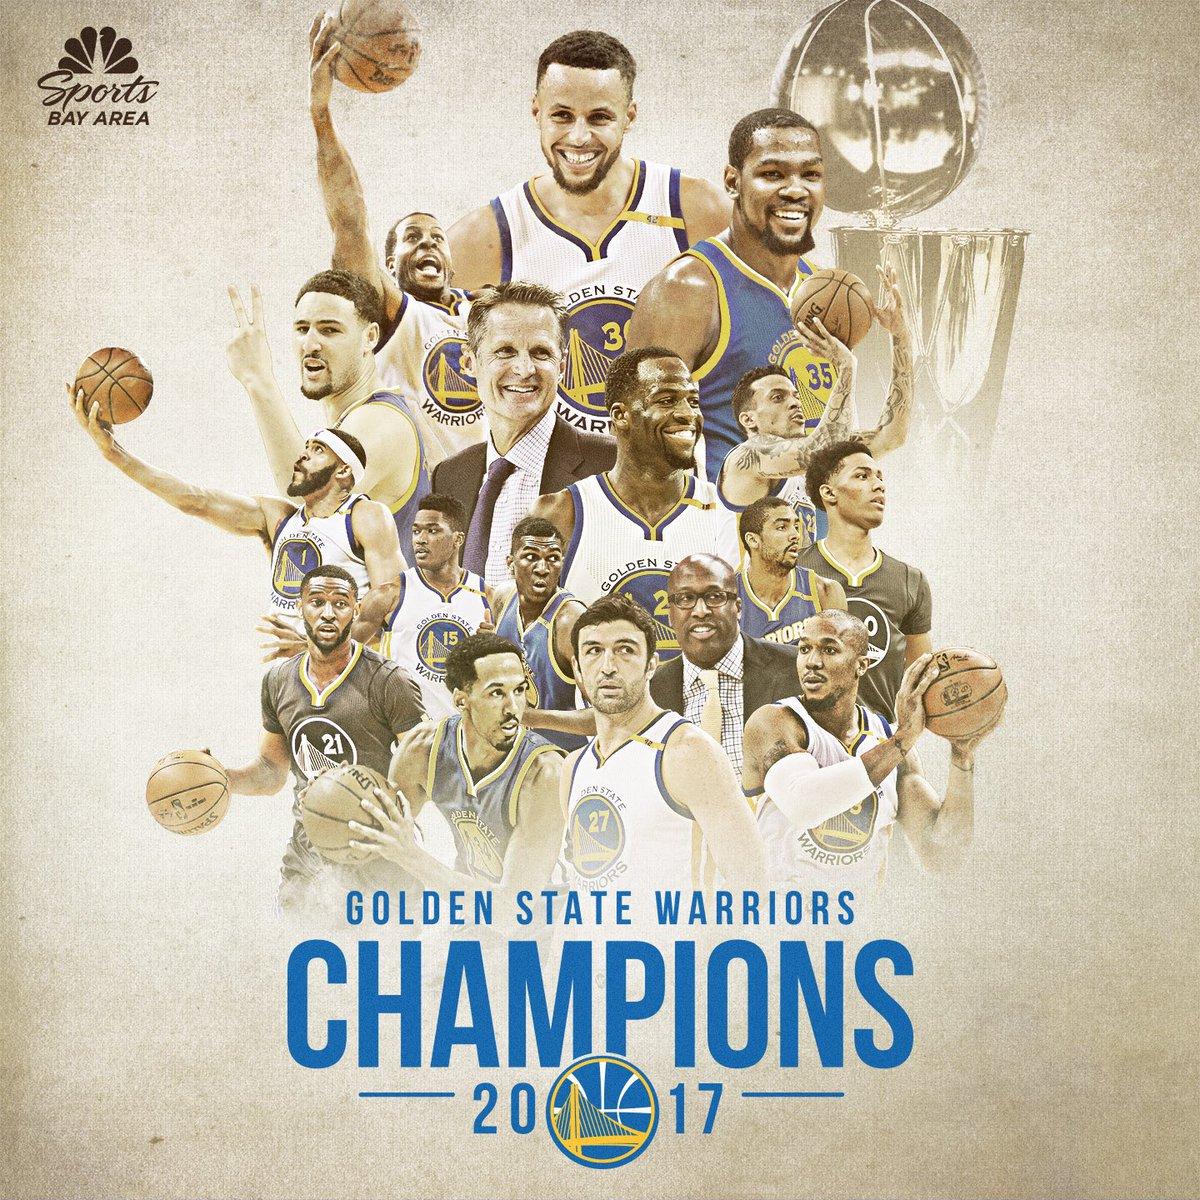 Warriors On Nbcs On Twitter 2017 Nba Champions